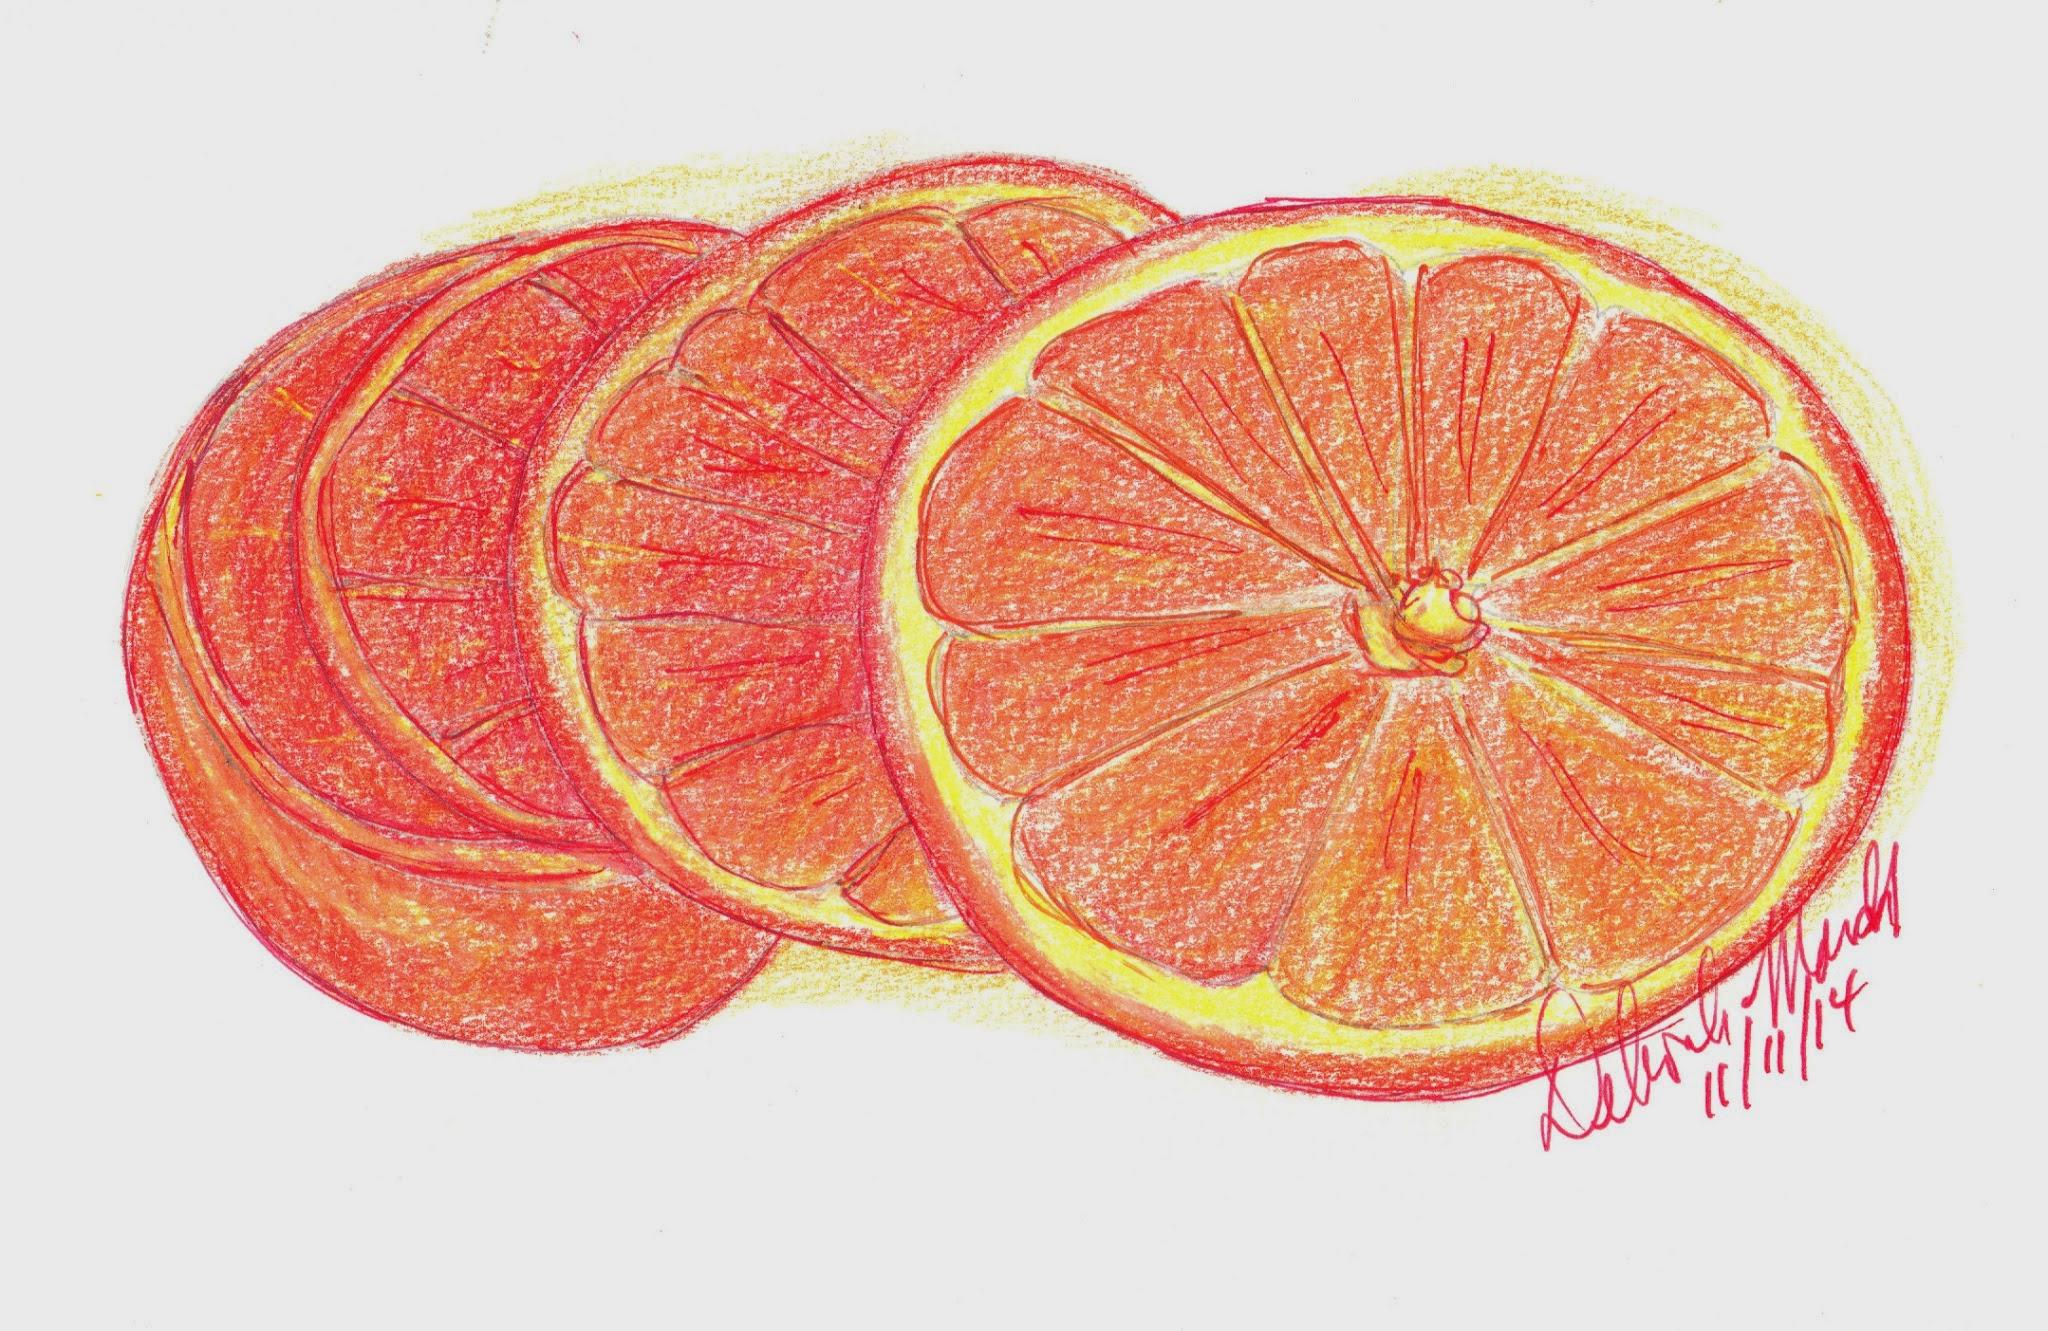 Sketchbook - Something Orange (2014)